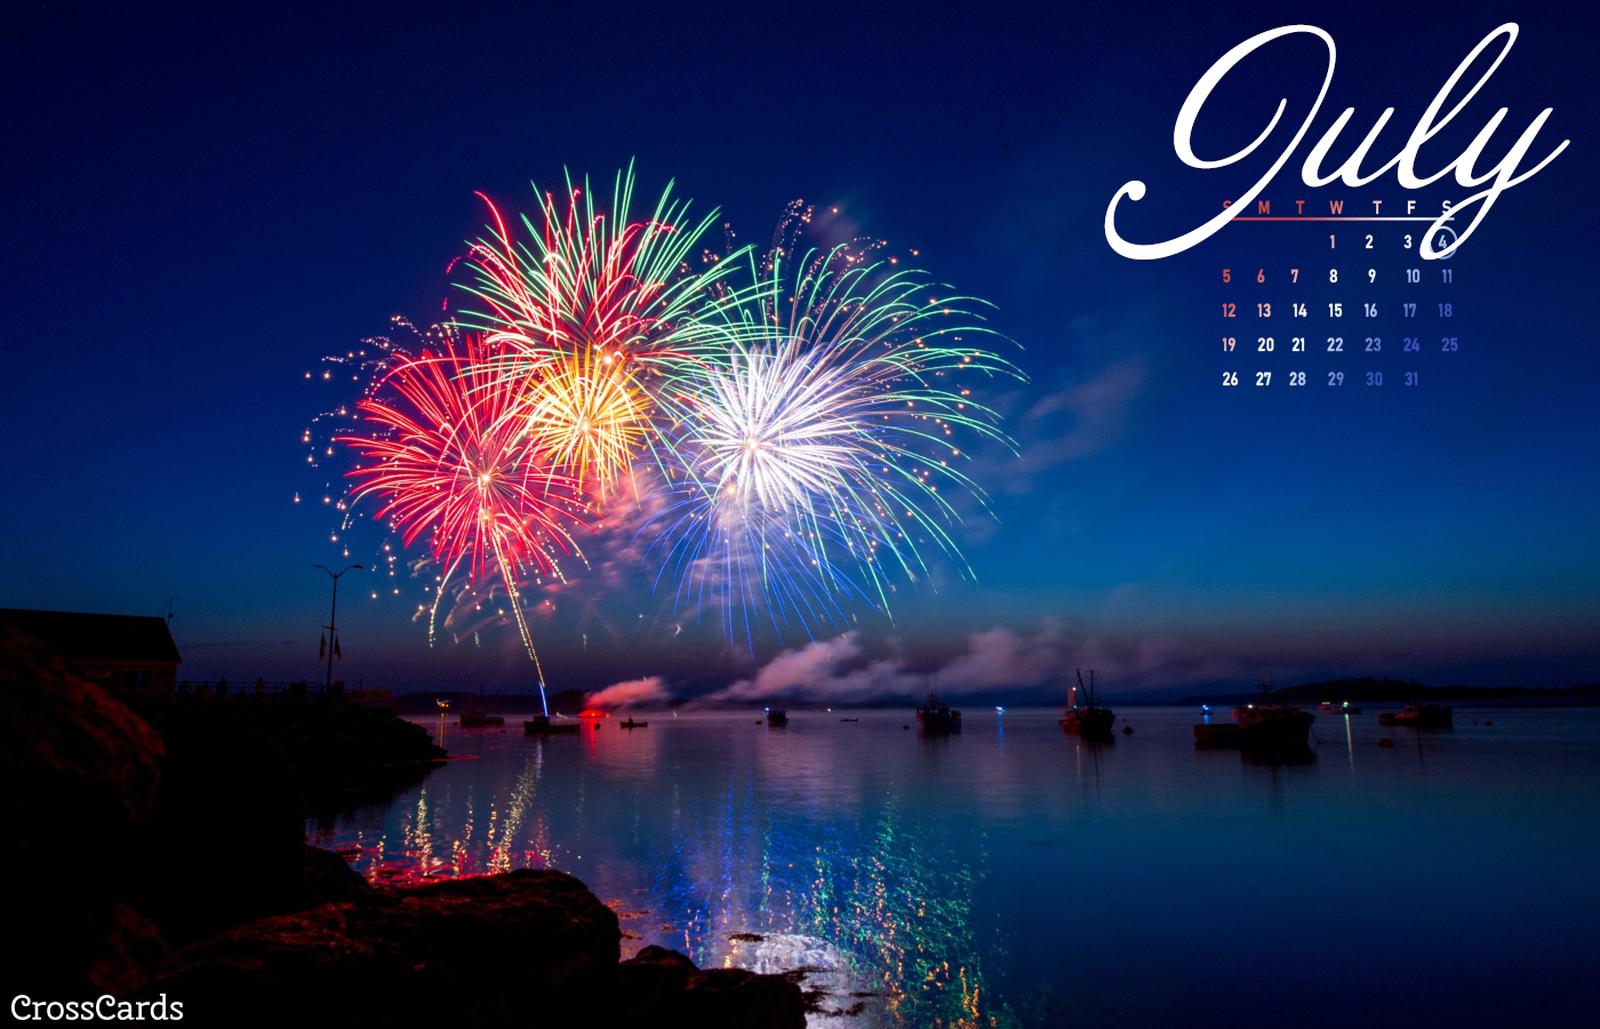 July 2020 - Fireworks mobile phone wallpaper